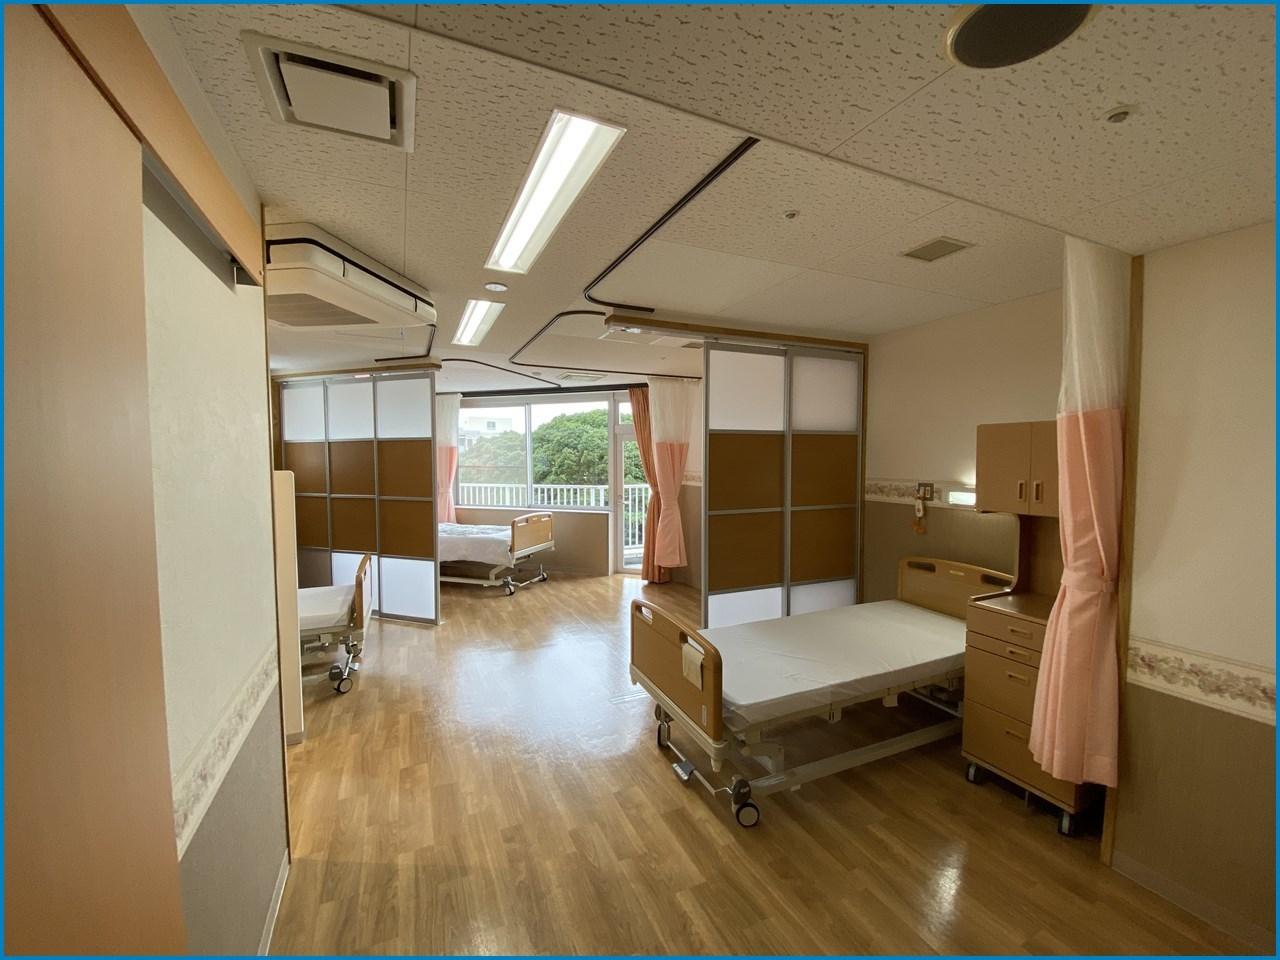 N病院グループ N病院東館 介護医療院転換改修工事 1_c0376508_16015864.jpg